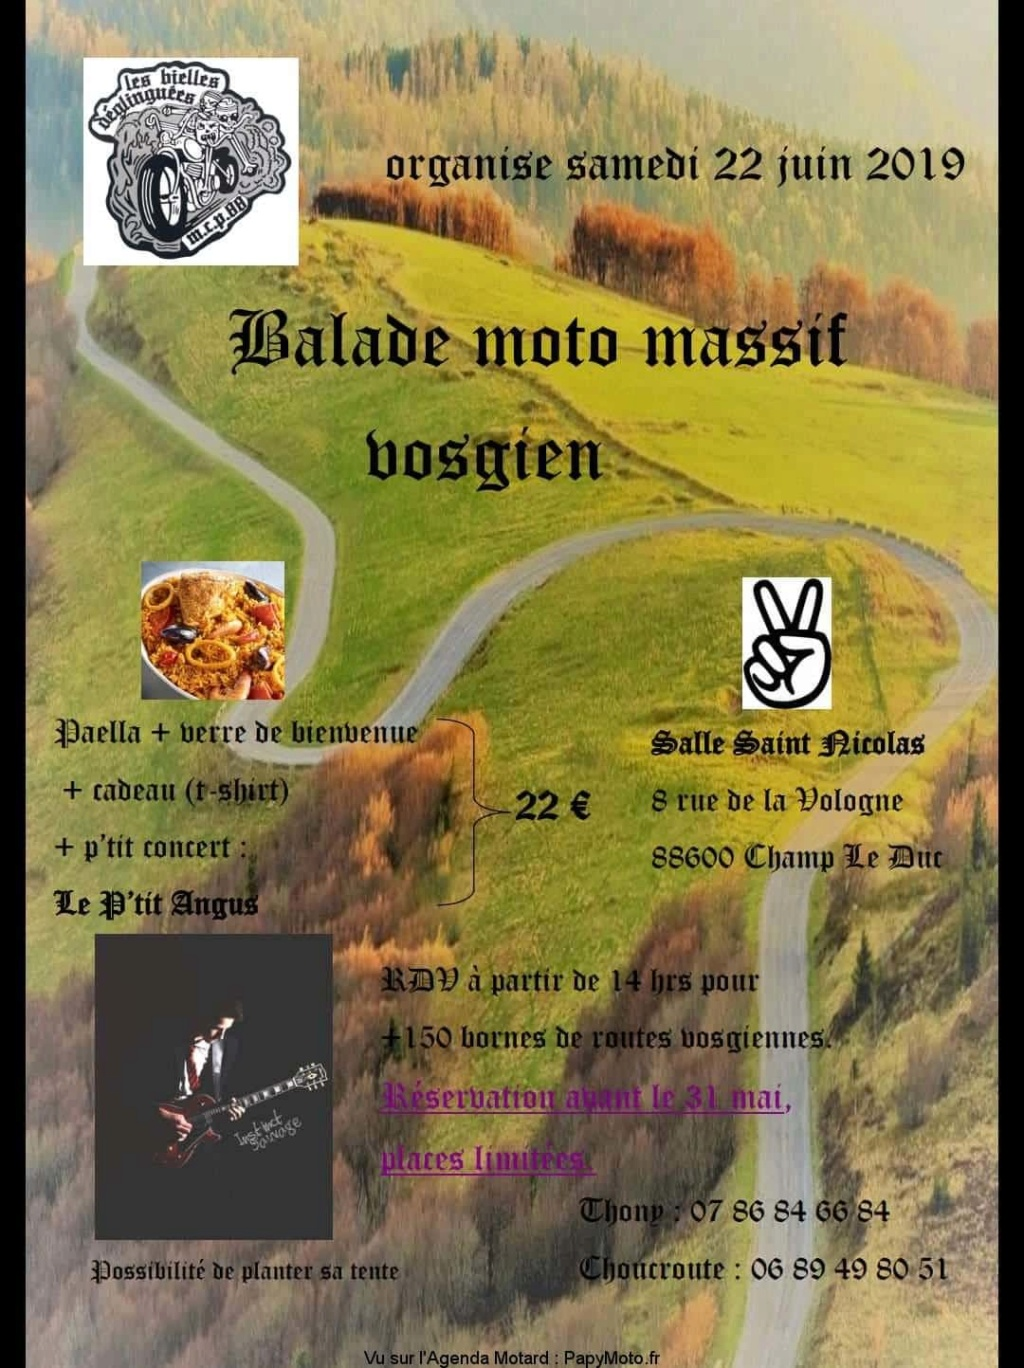 MANIFESTATION - Balade  Moto Massif Vosgien - Samedi 22 Juin 2019 - Champ Le Duc -( 88600 )) Balade92